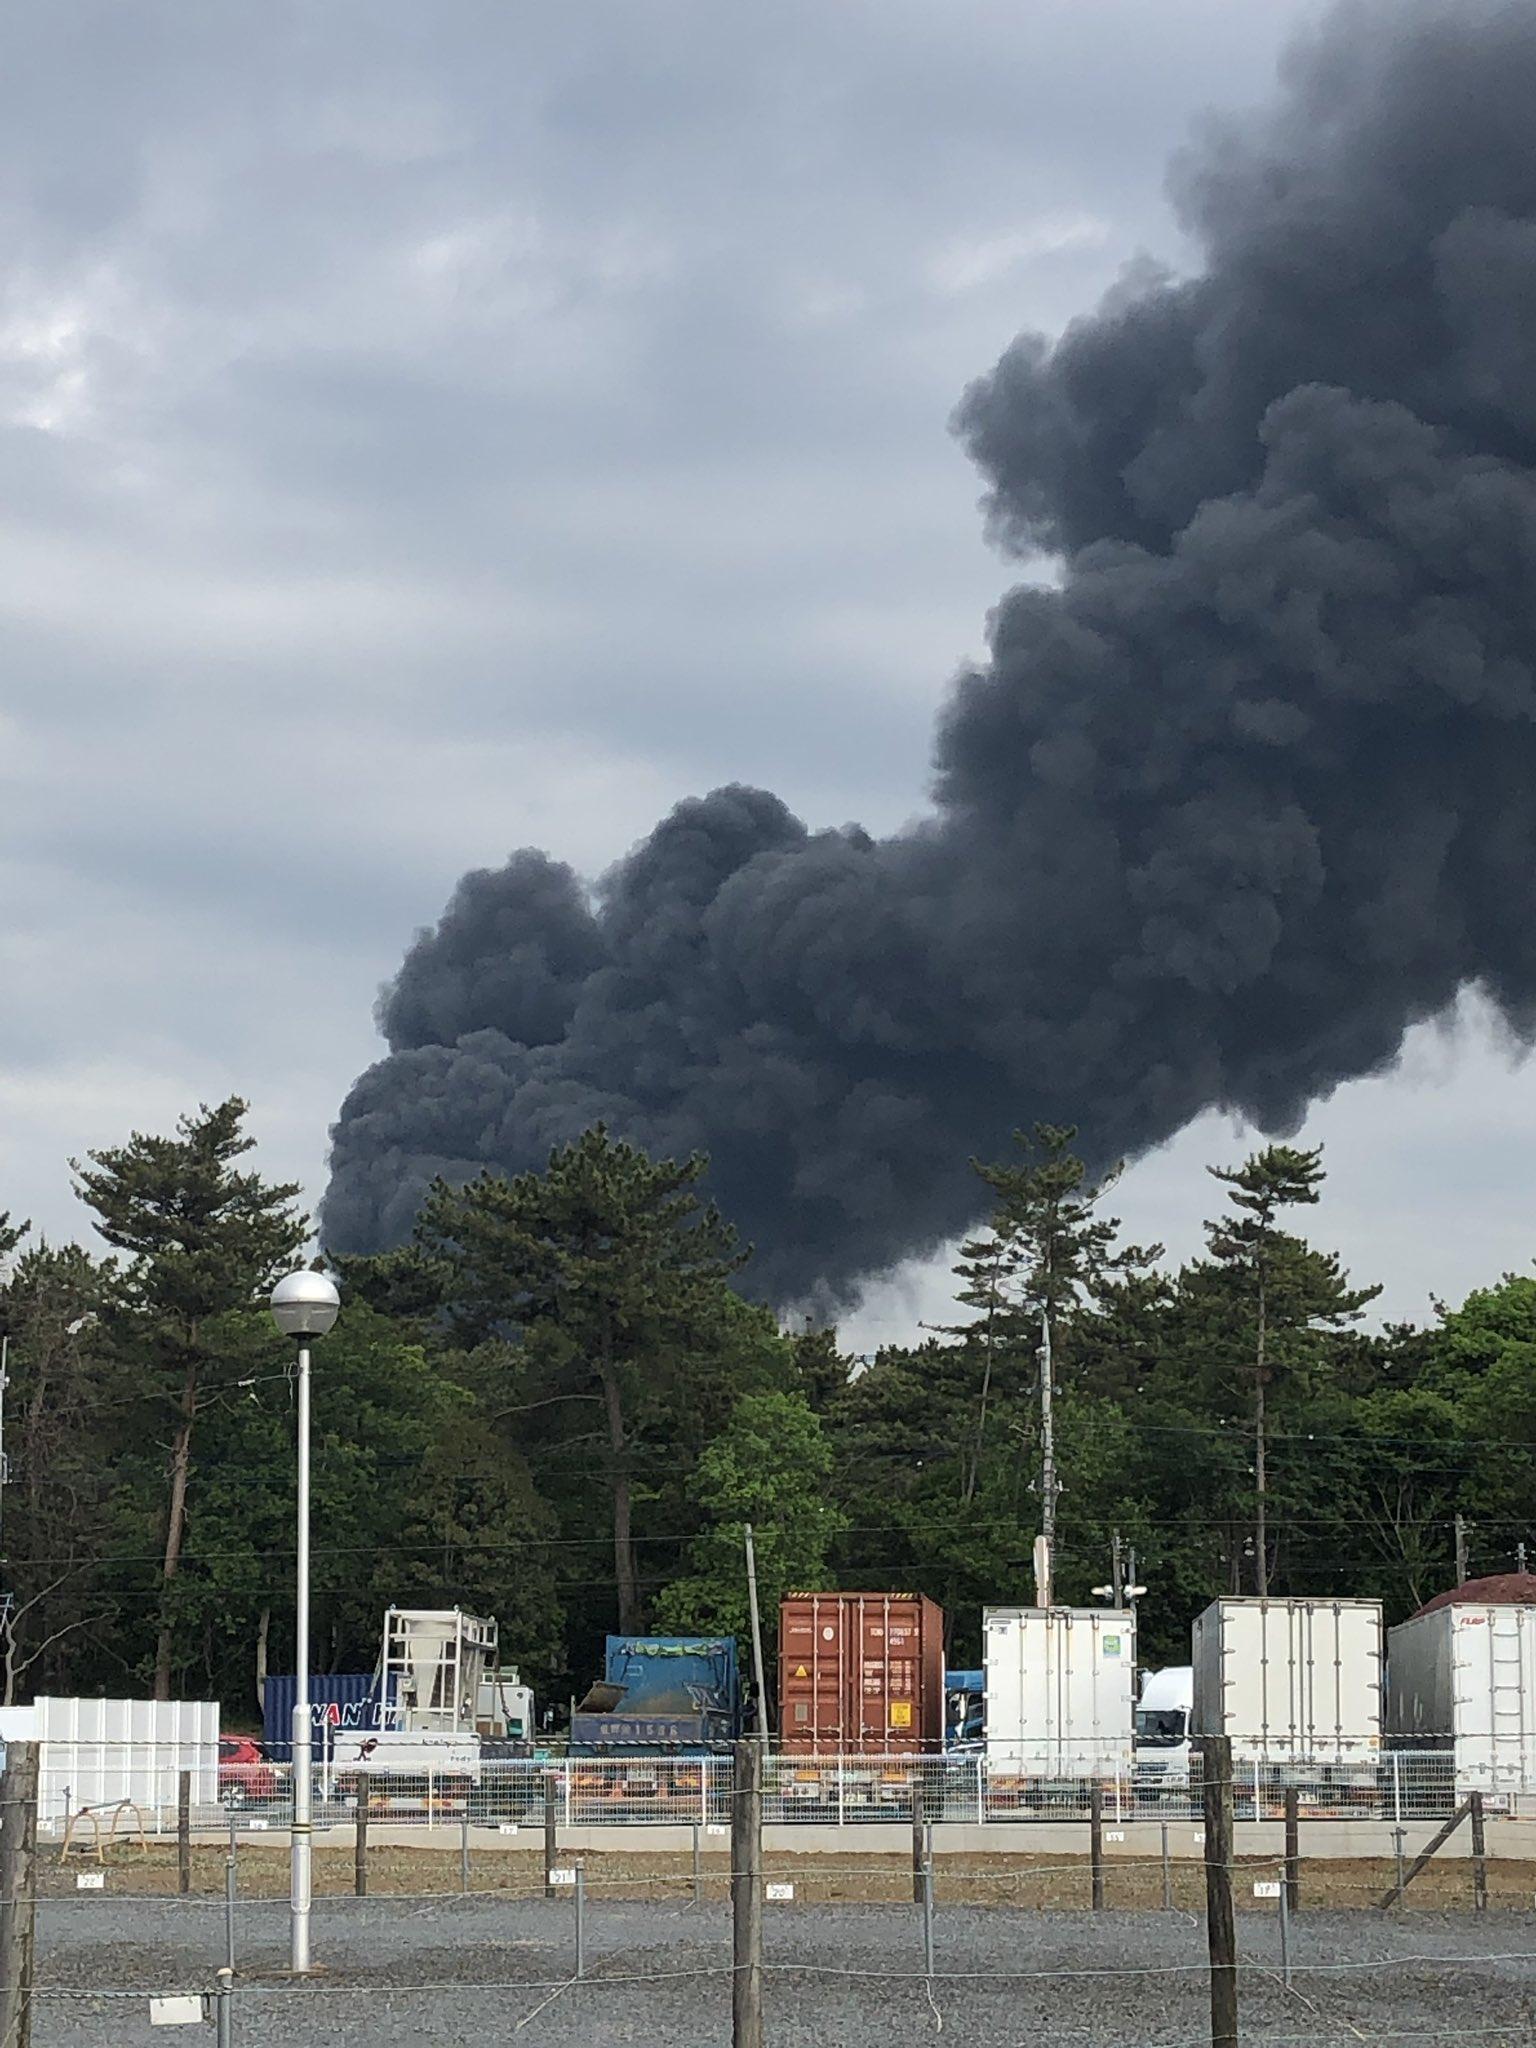 画像,常総市火事 https://t.co/L9DlB5dviD。